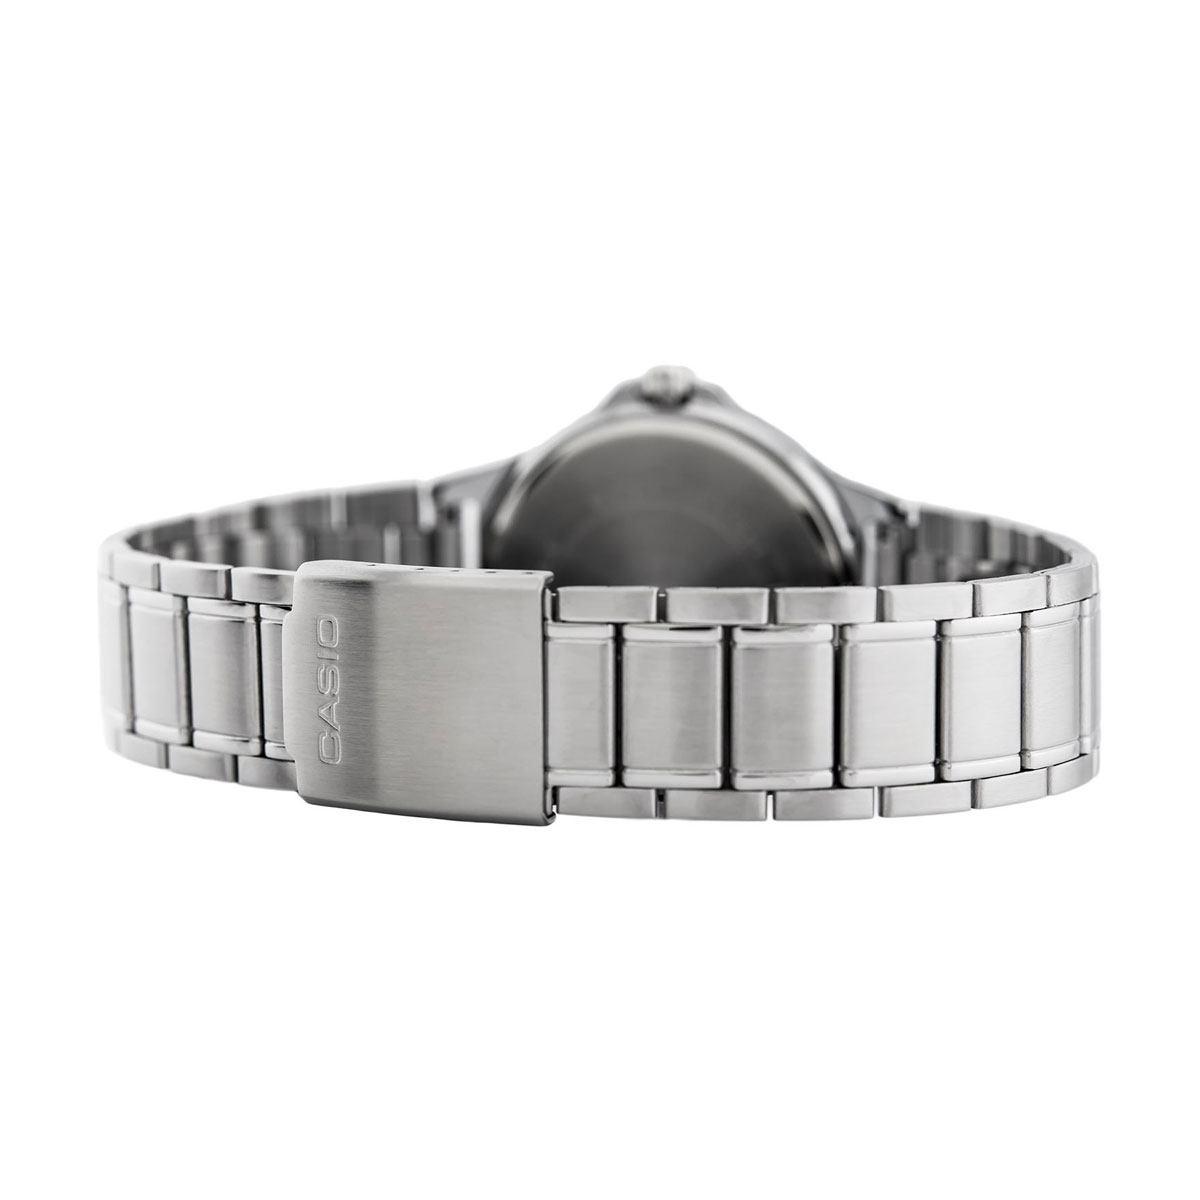 Часовник Casio MTP-V300D-7A2U